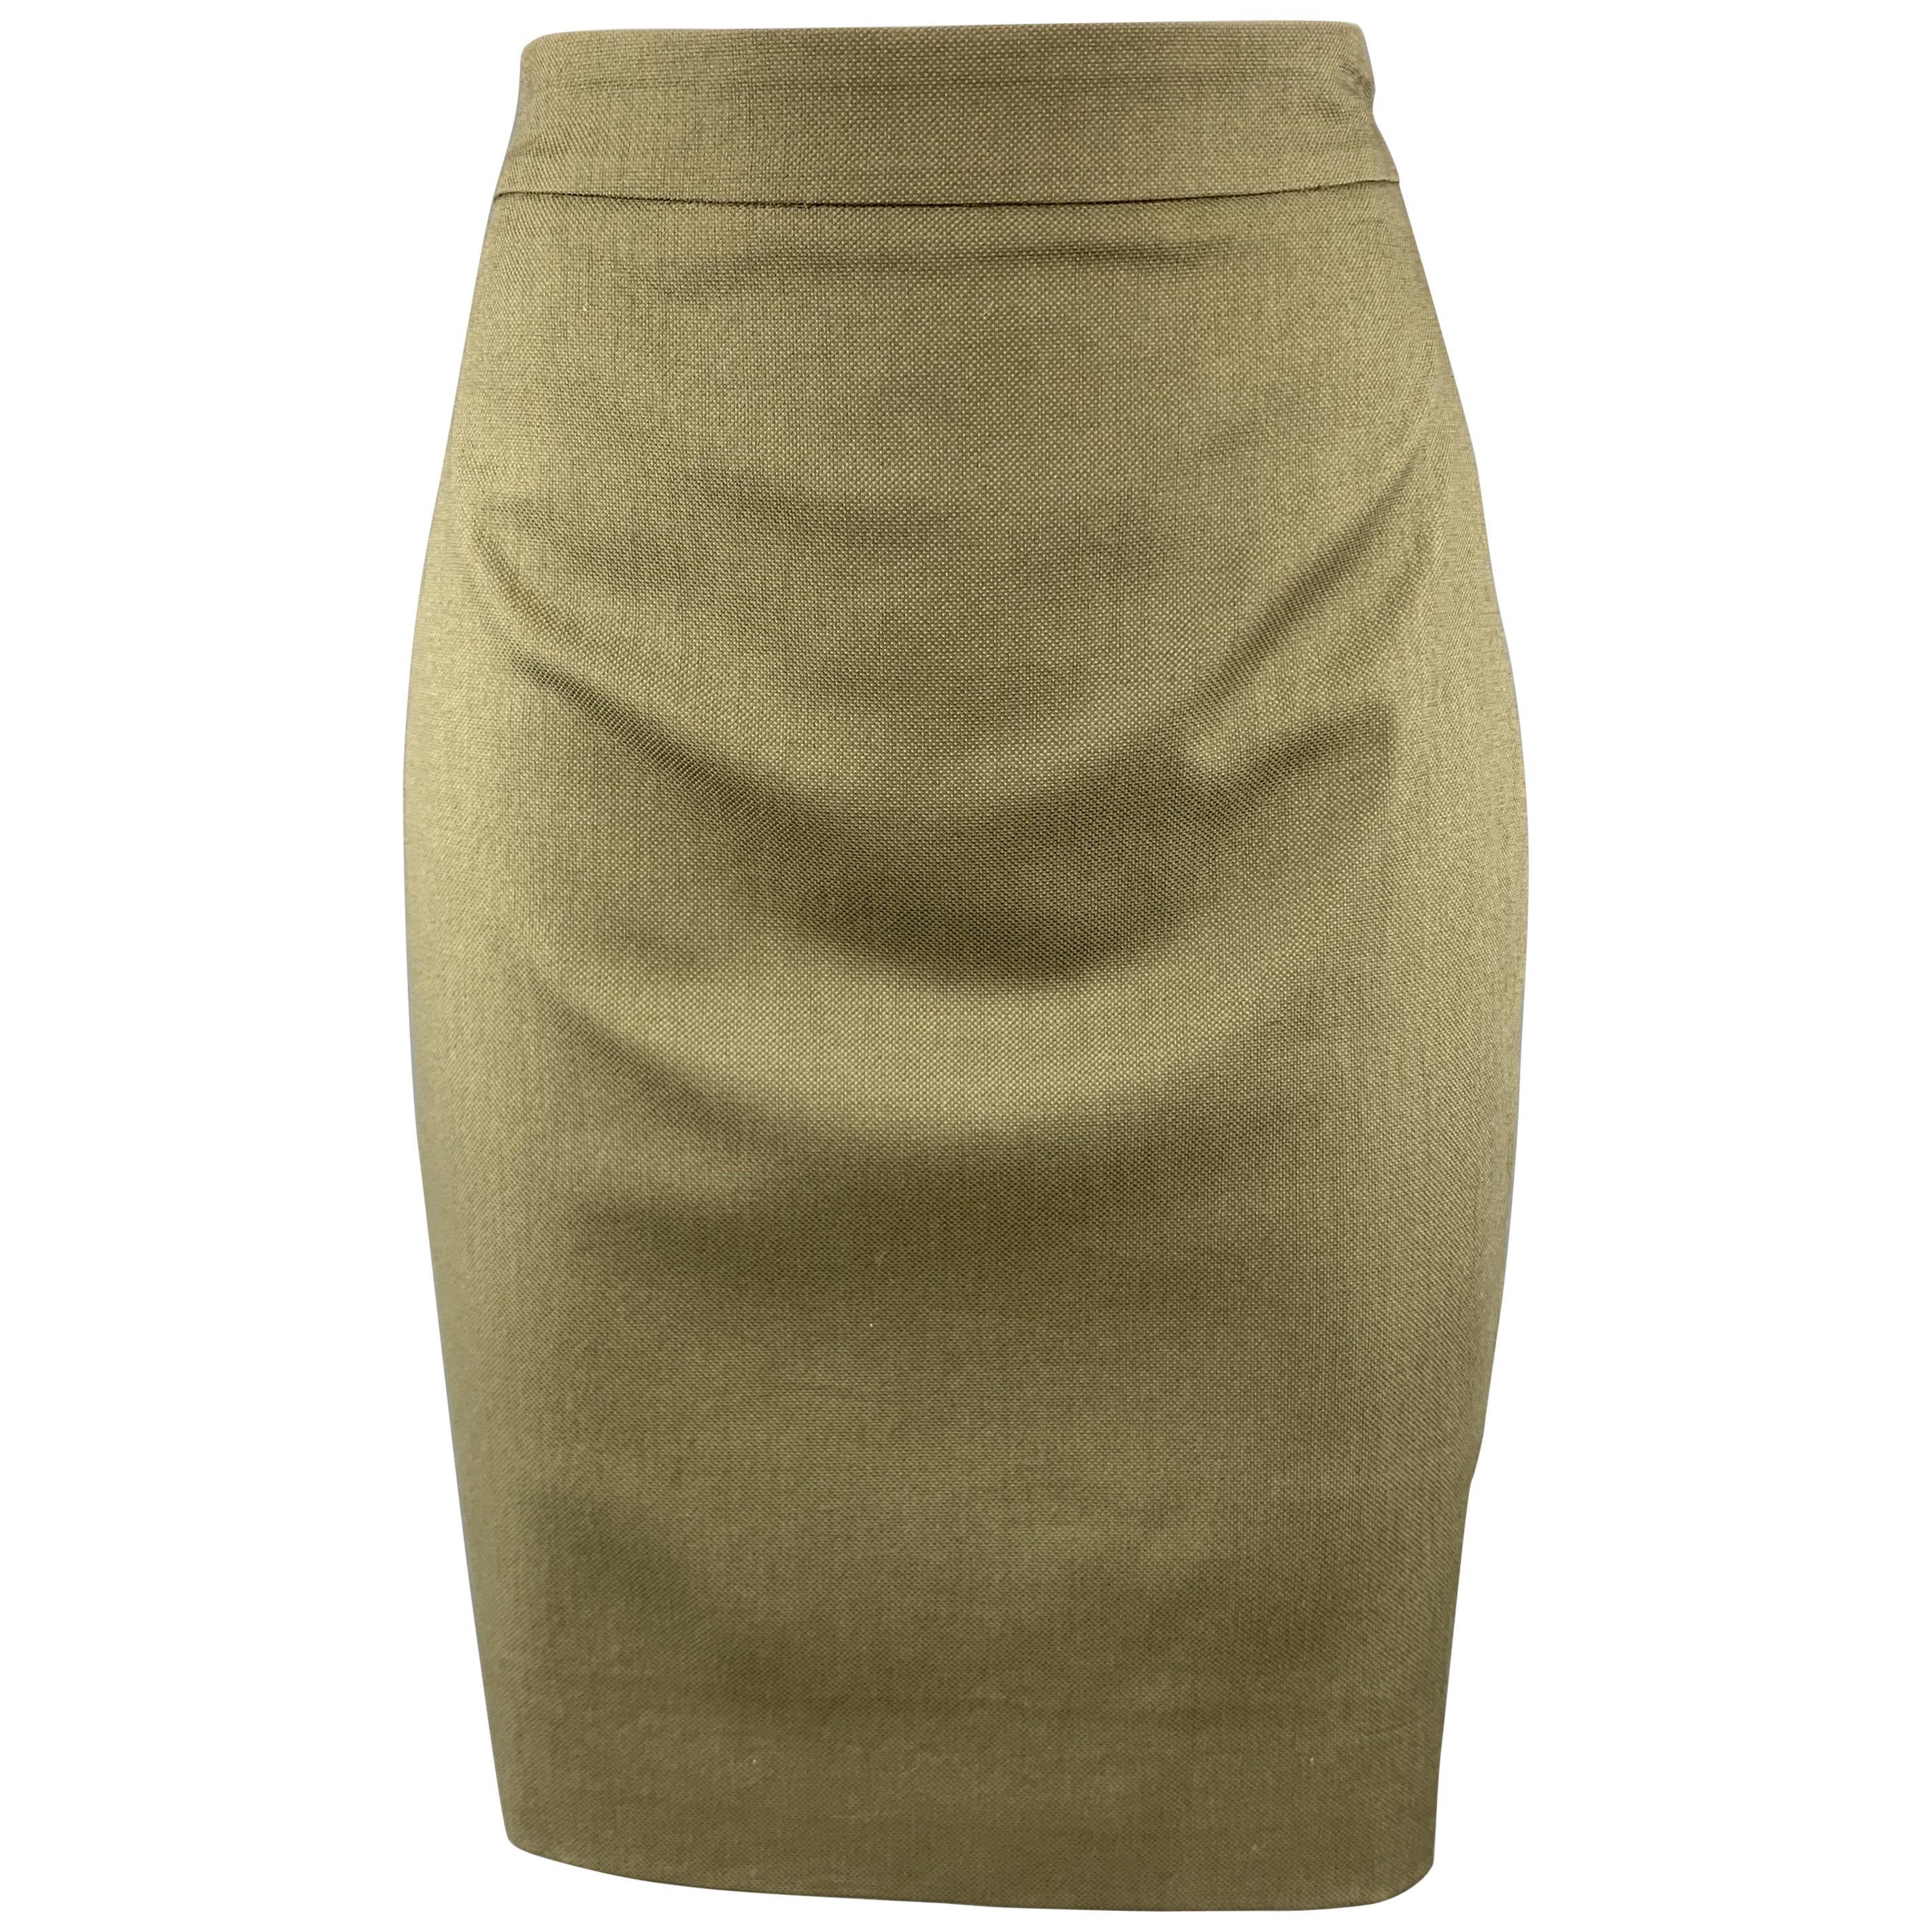 GIVENCHY Size 4 Olive Cotton Blend Canvas Pencil Skirt